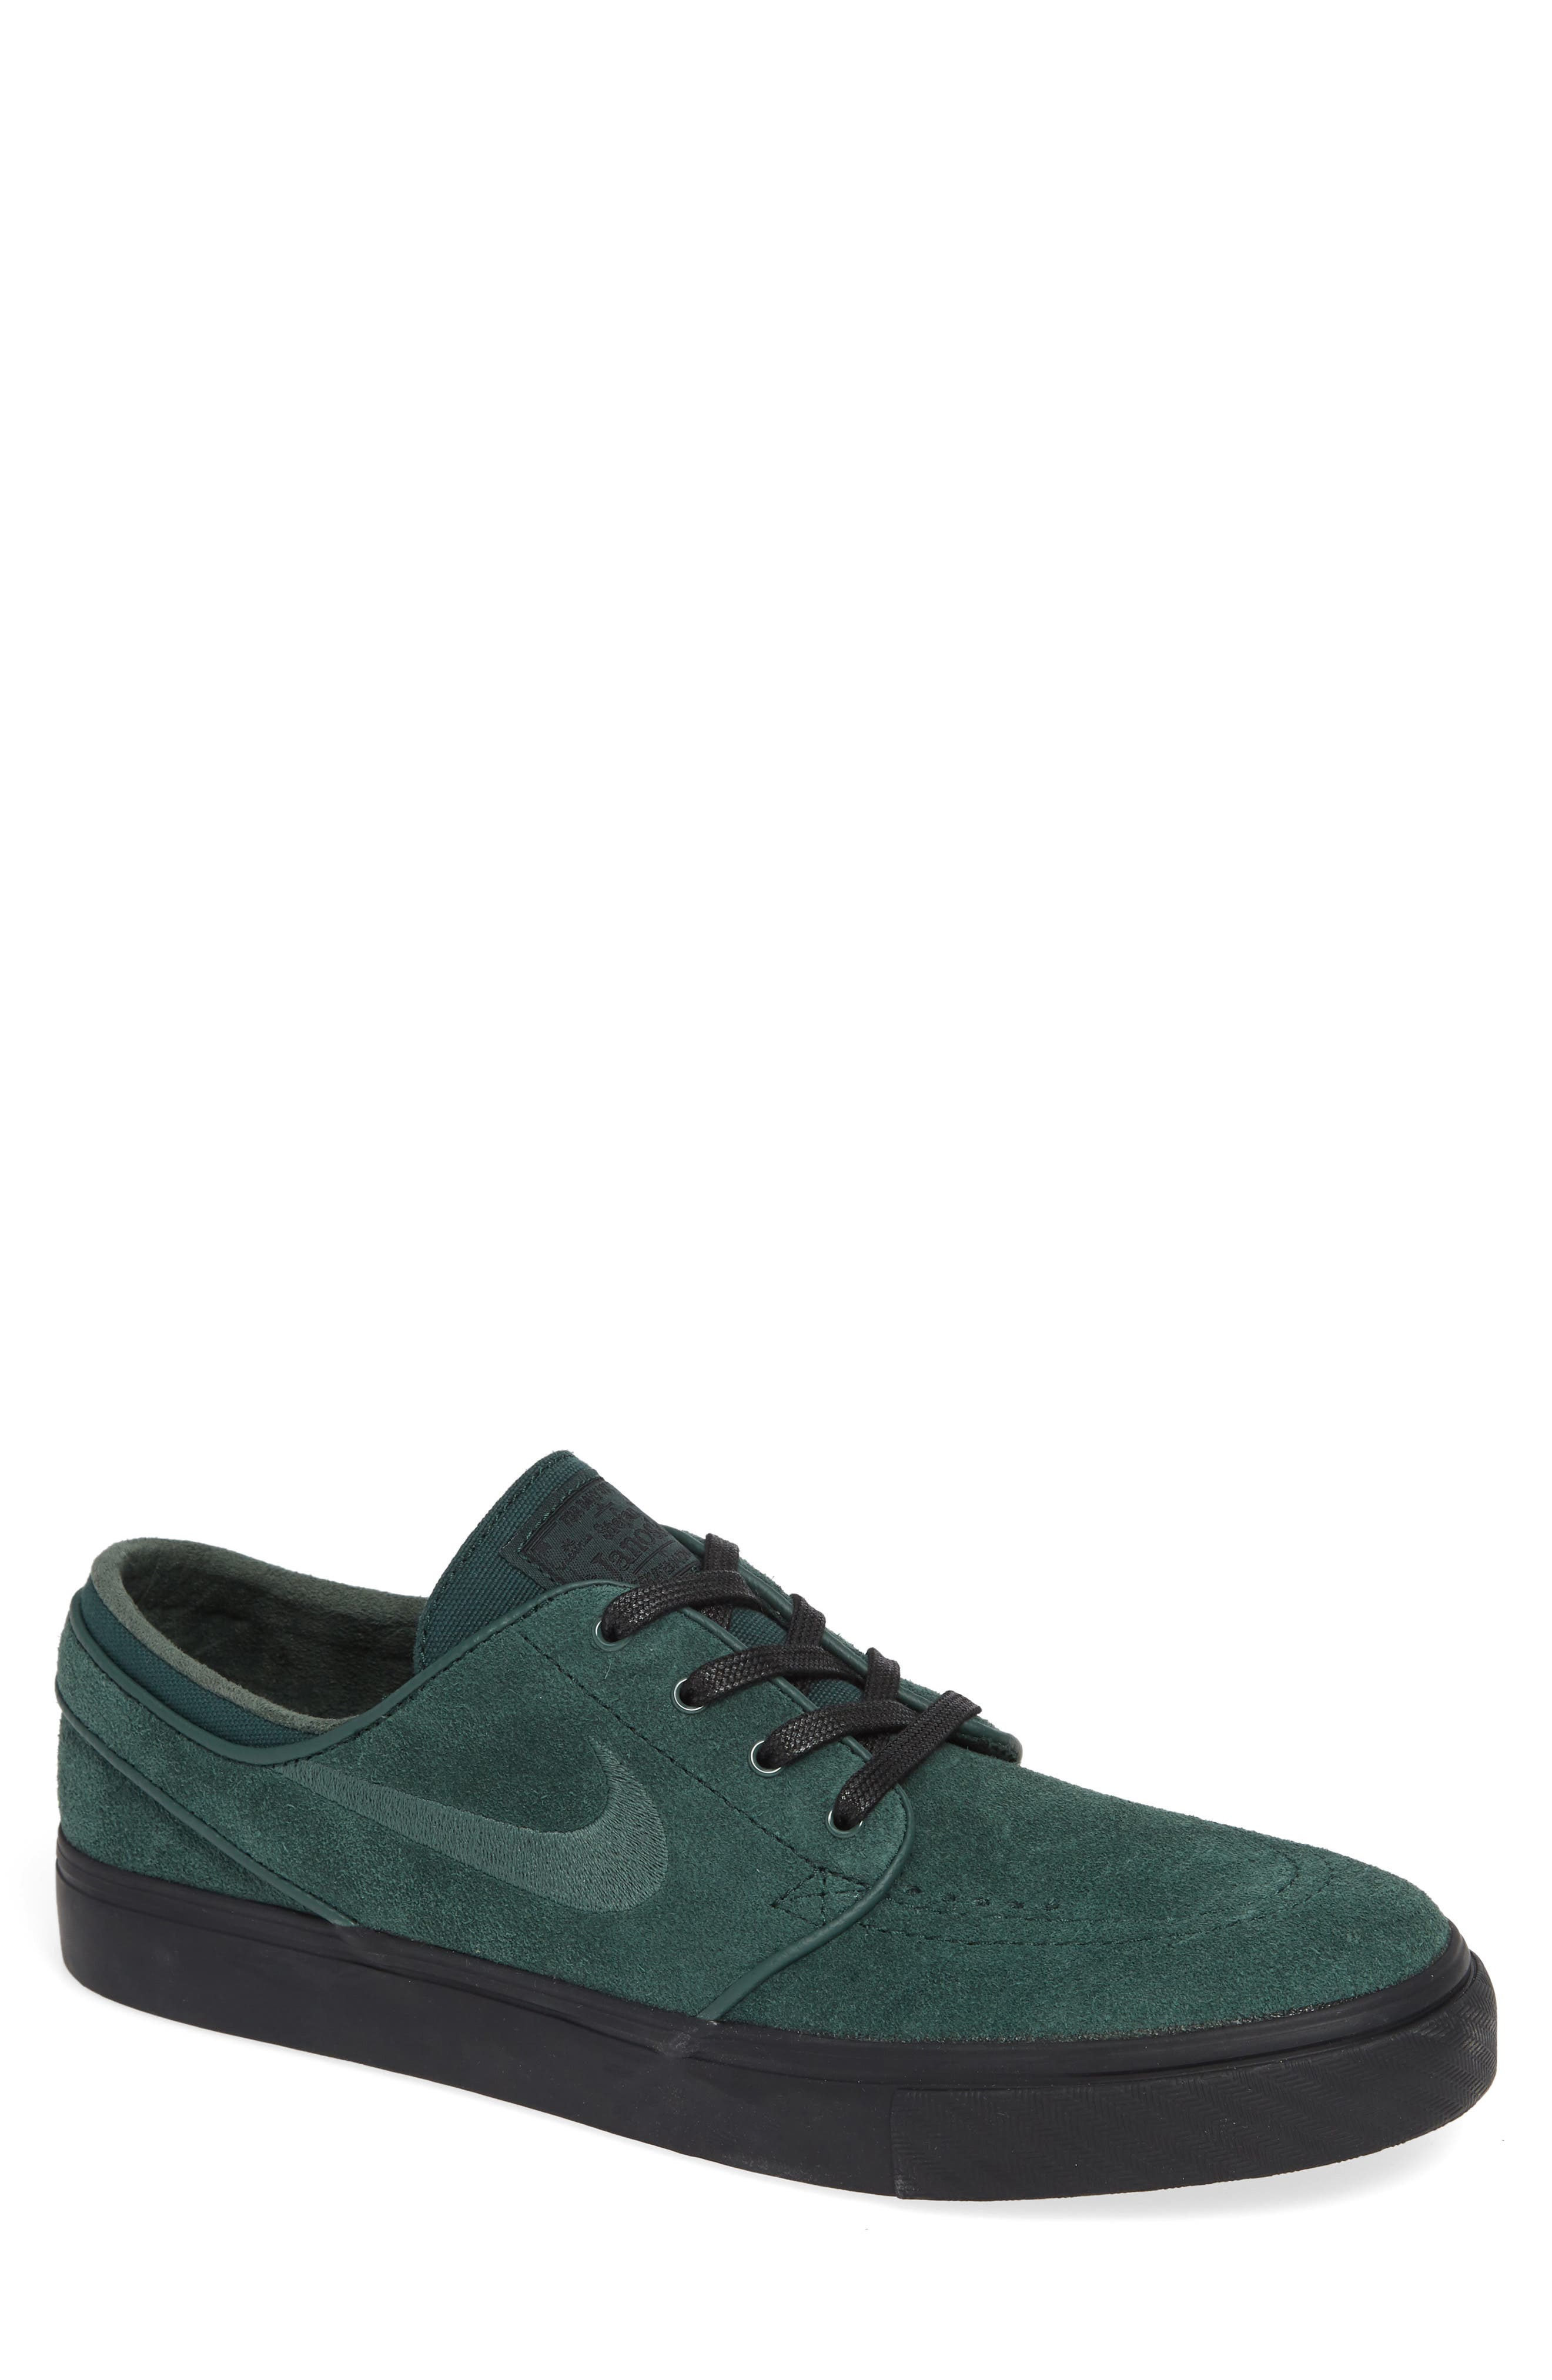 'Zoom - Stefan Janoski' Skate Shoe,                             Main thumbnail 1, color,                             Midnight Green/ Black